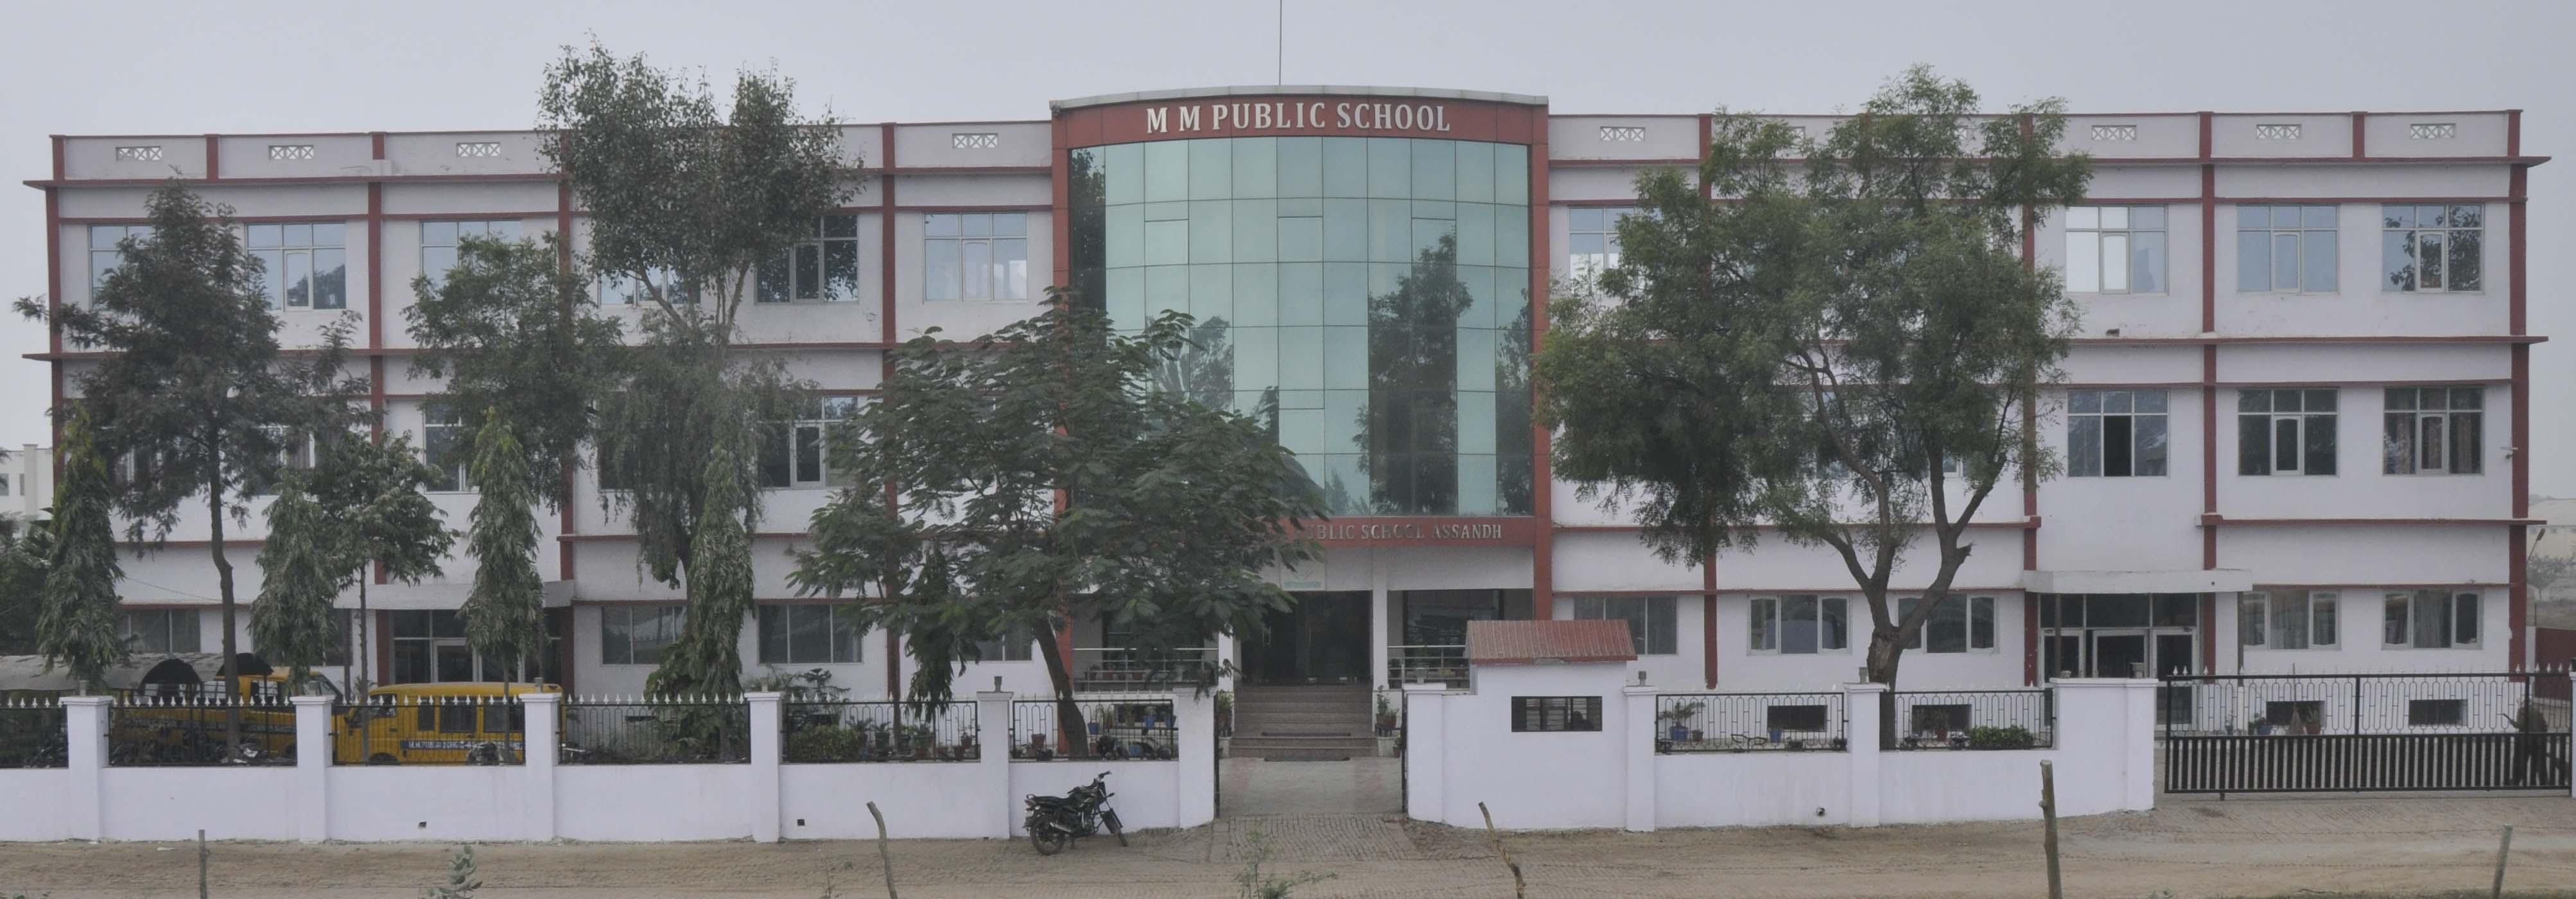 MAHARISHI MEINHIEN PUBLIC SCHOOL KARNAL ROAD ASSANDH DISTT KARNAL HARYANA 530502